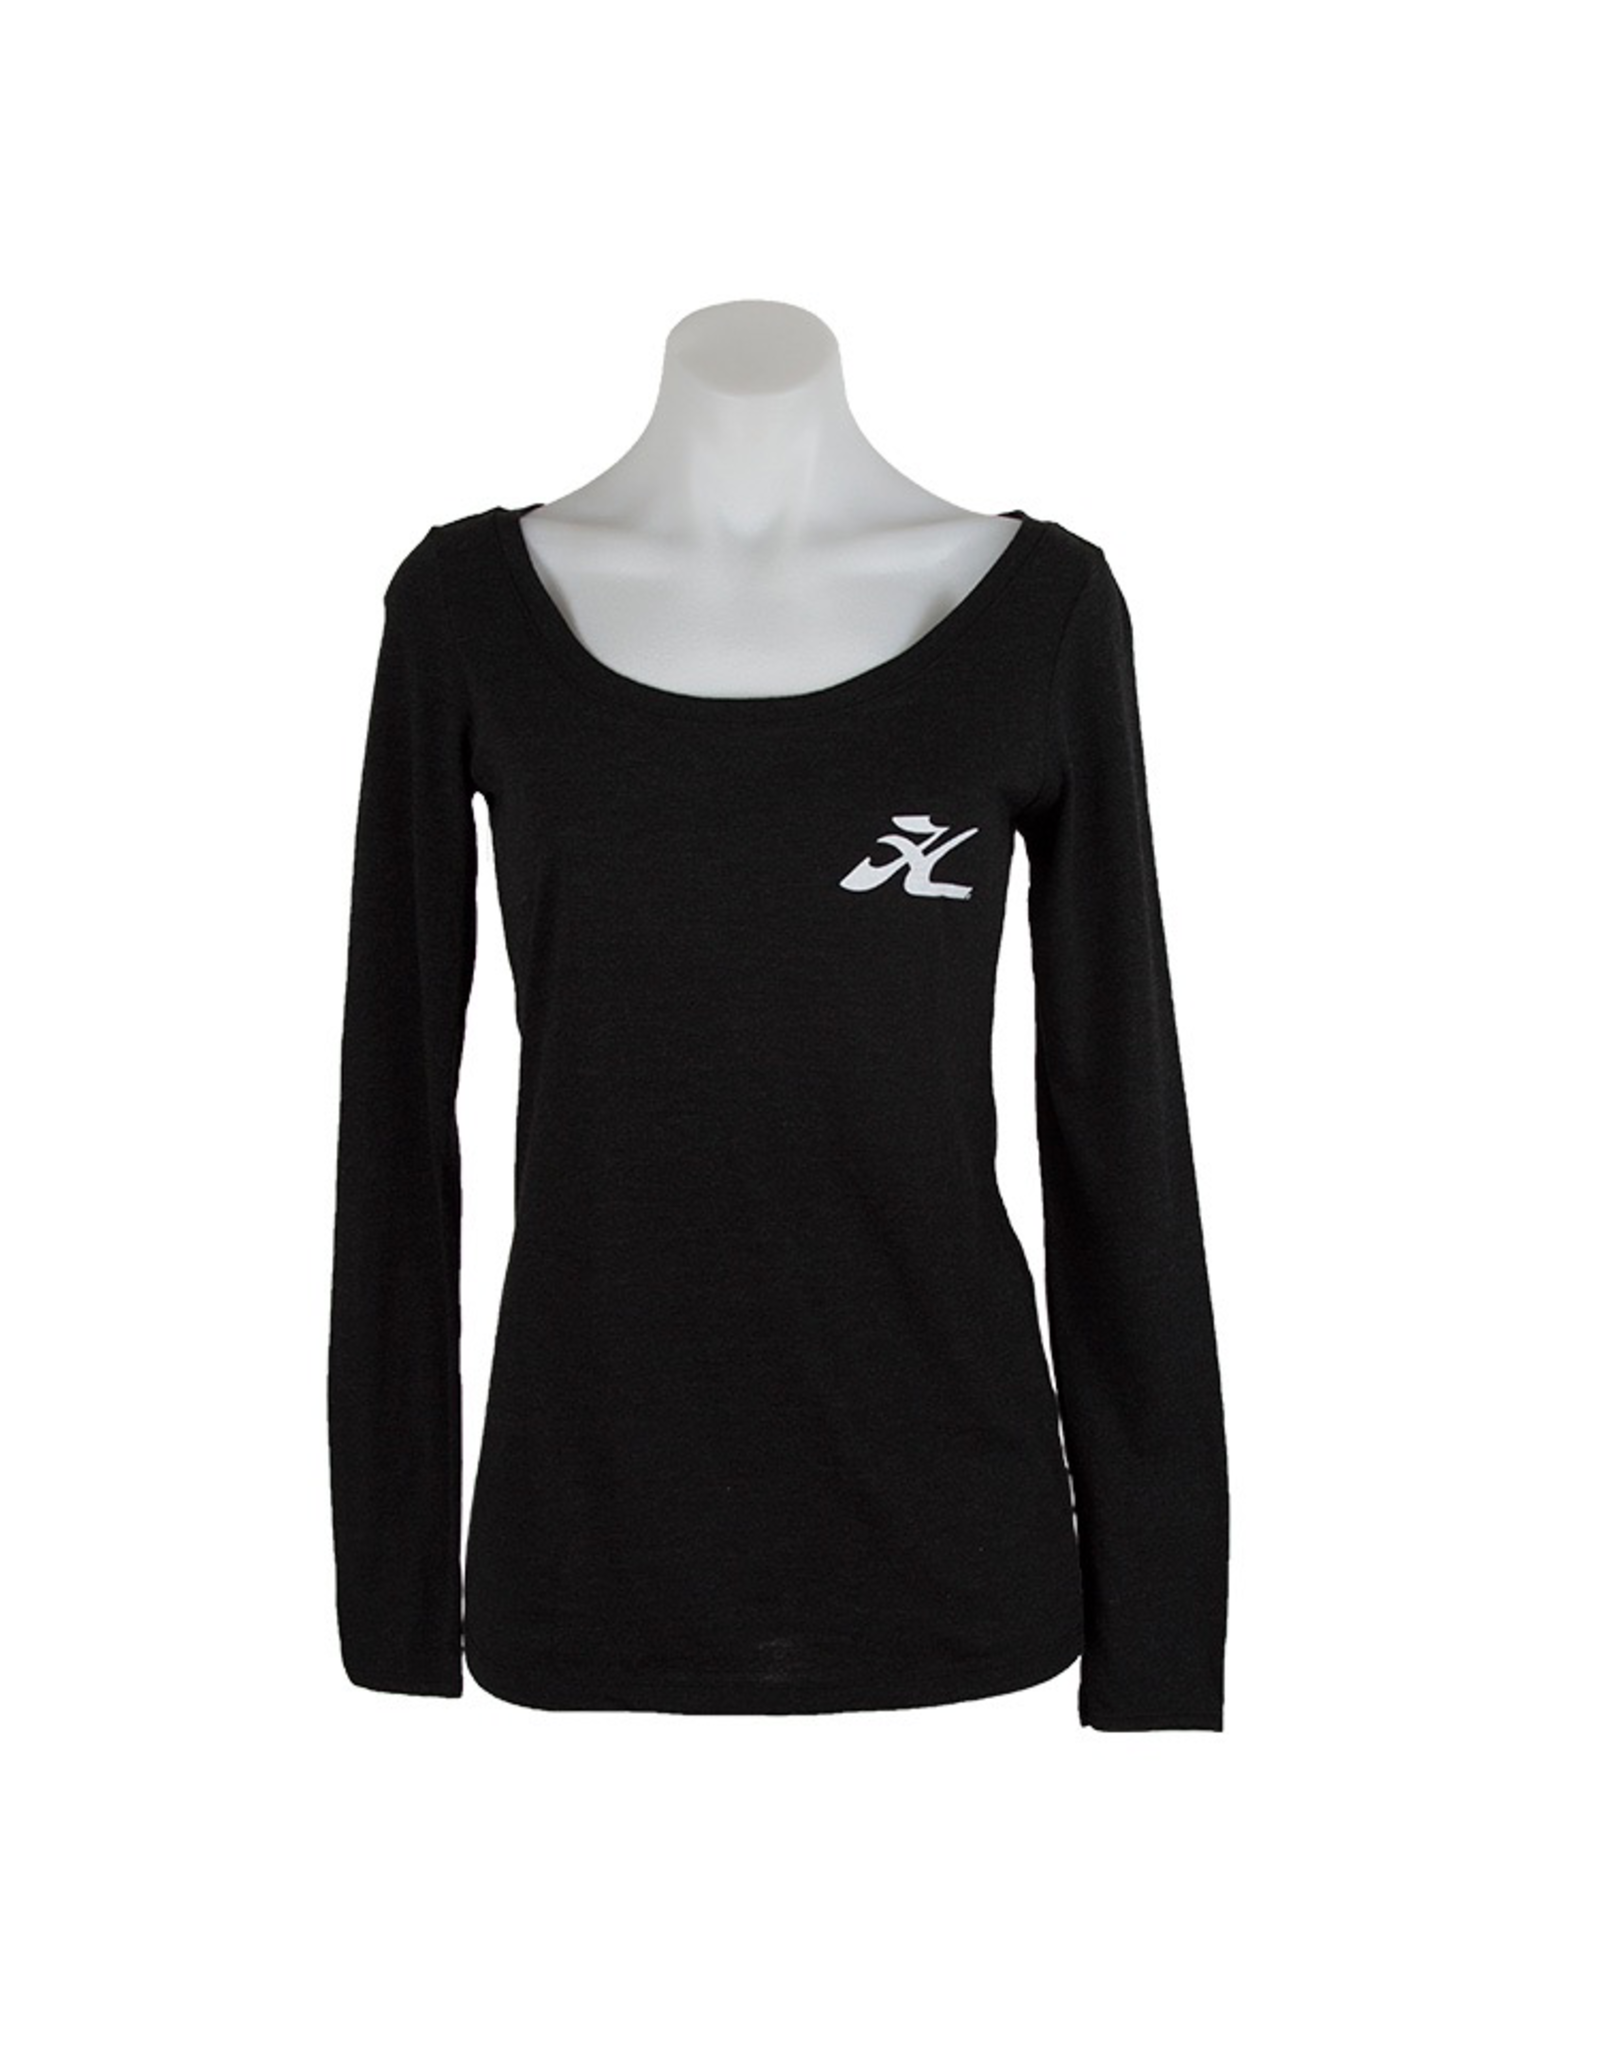 Hobie Hobie Ladies Charcoal Long Sleeve T-Shirt, Scoop Neck, Flying H Logo